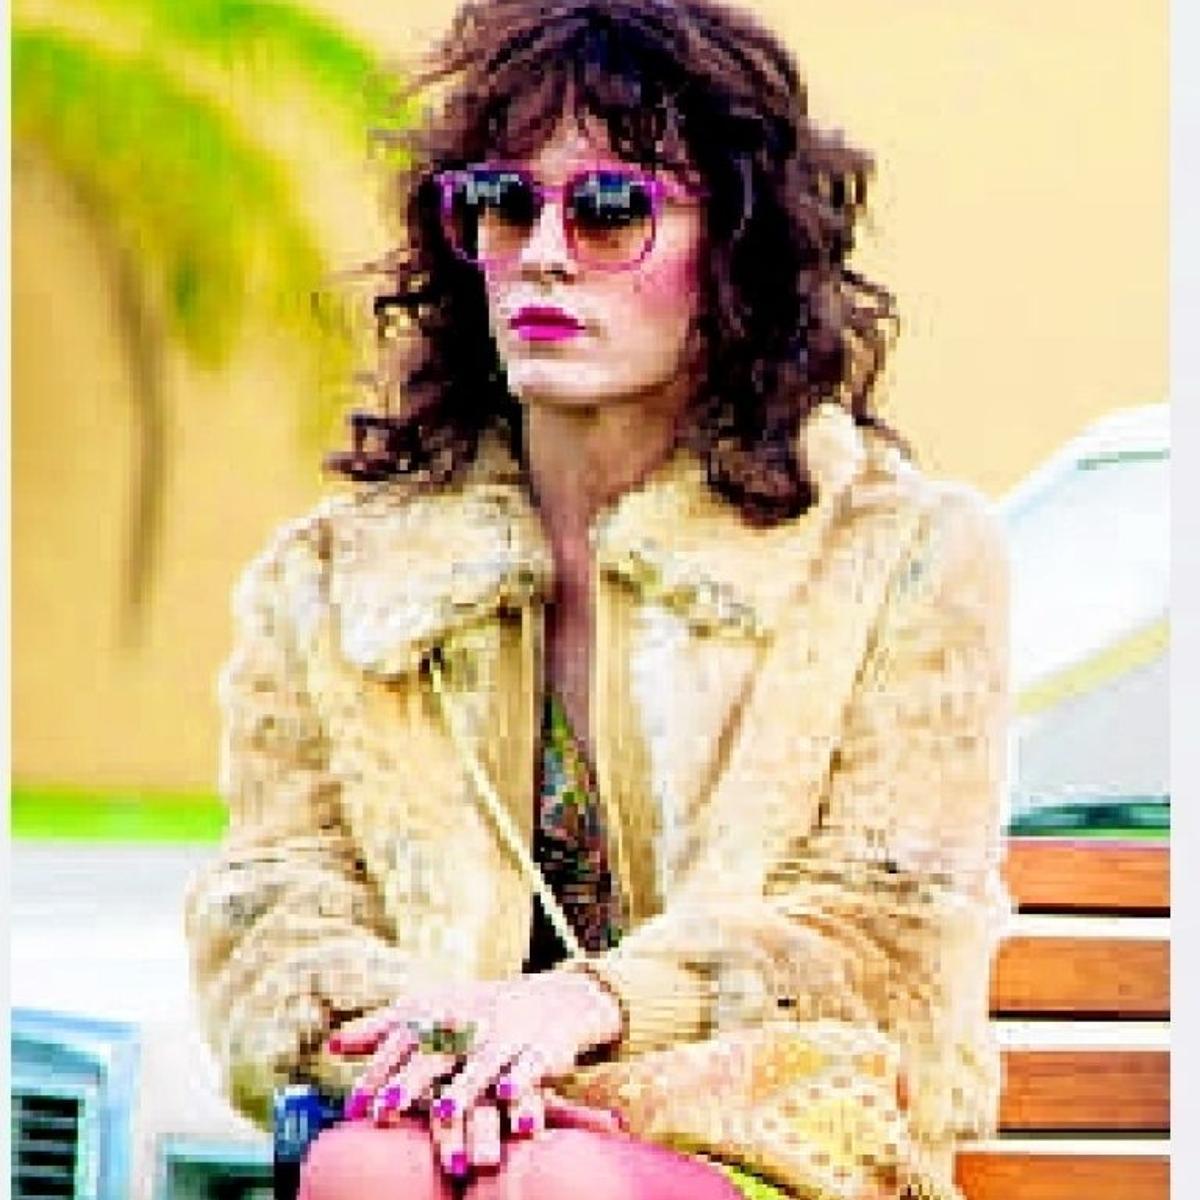 Intense Focus Preparation Transform Actors For Aids Drama Dallas Buyers Club Richmond Com